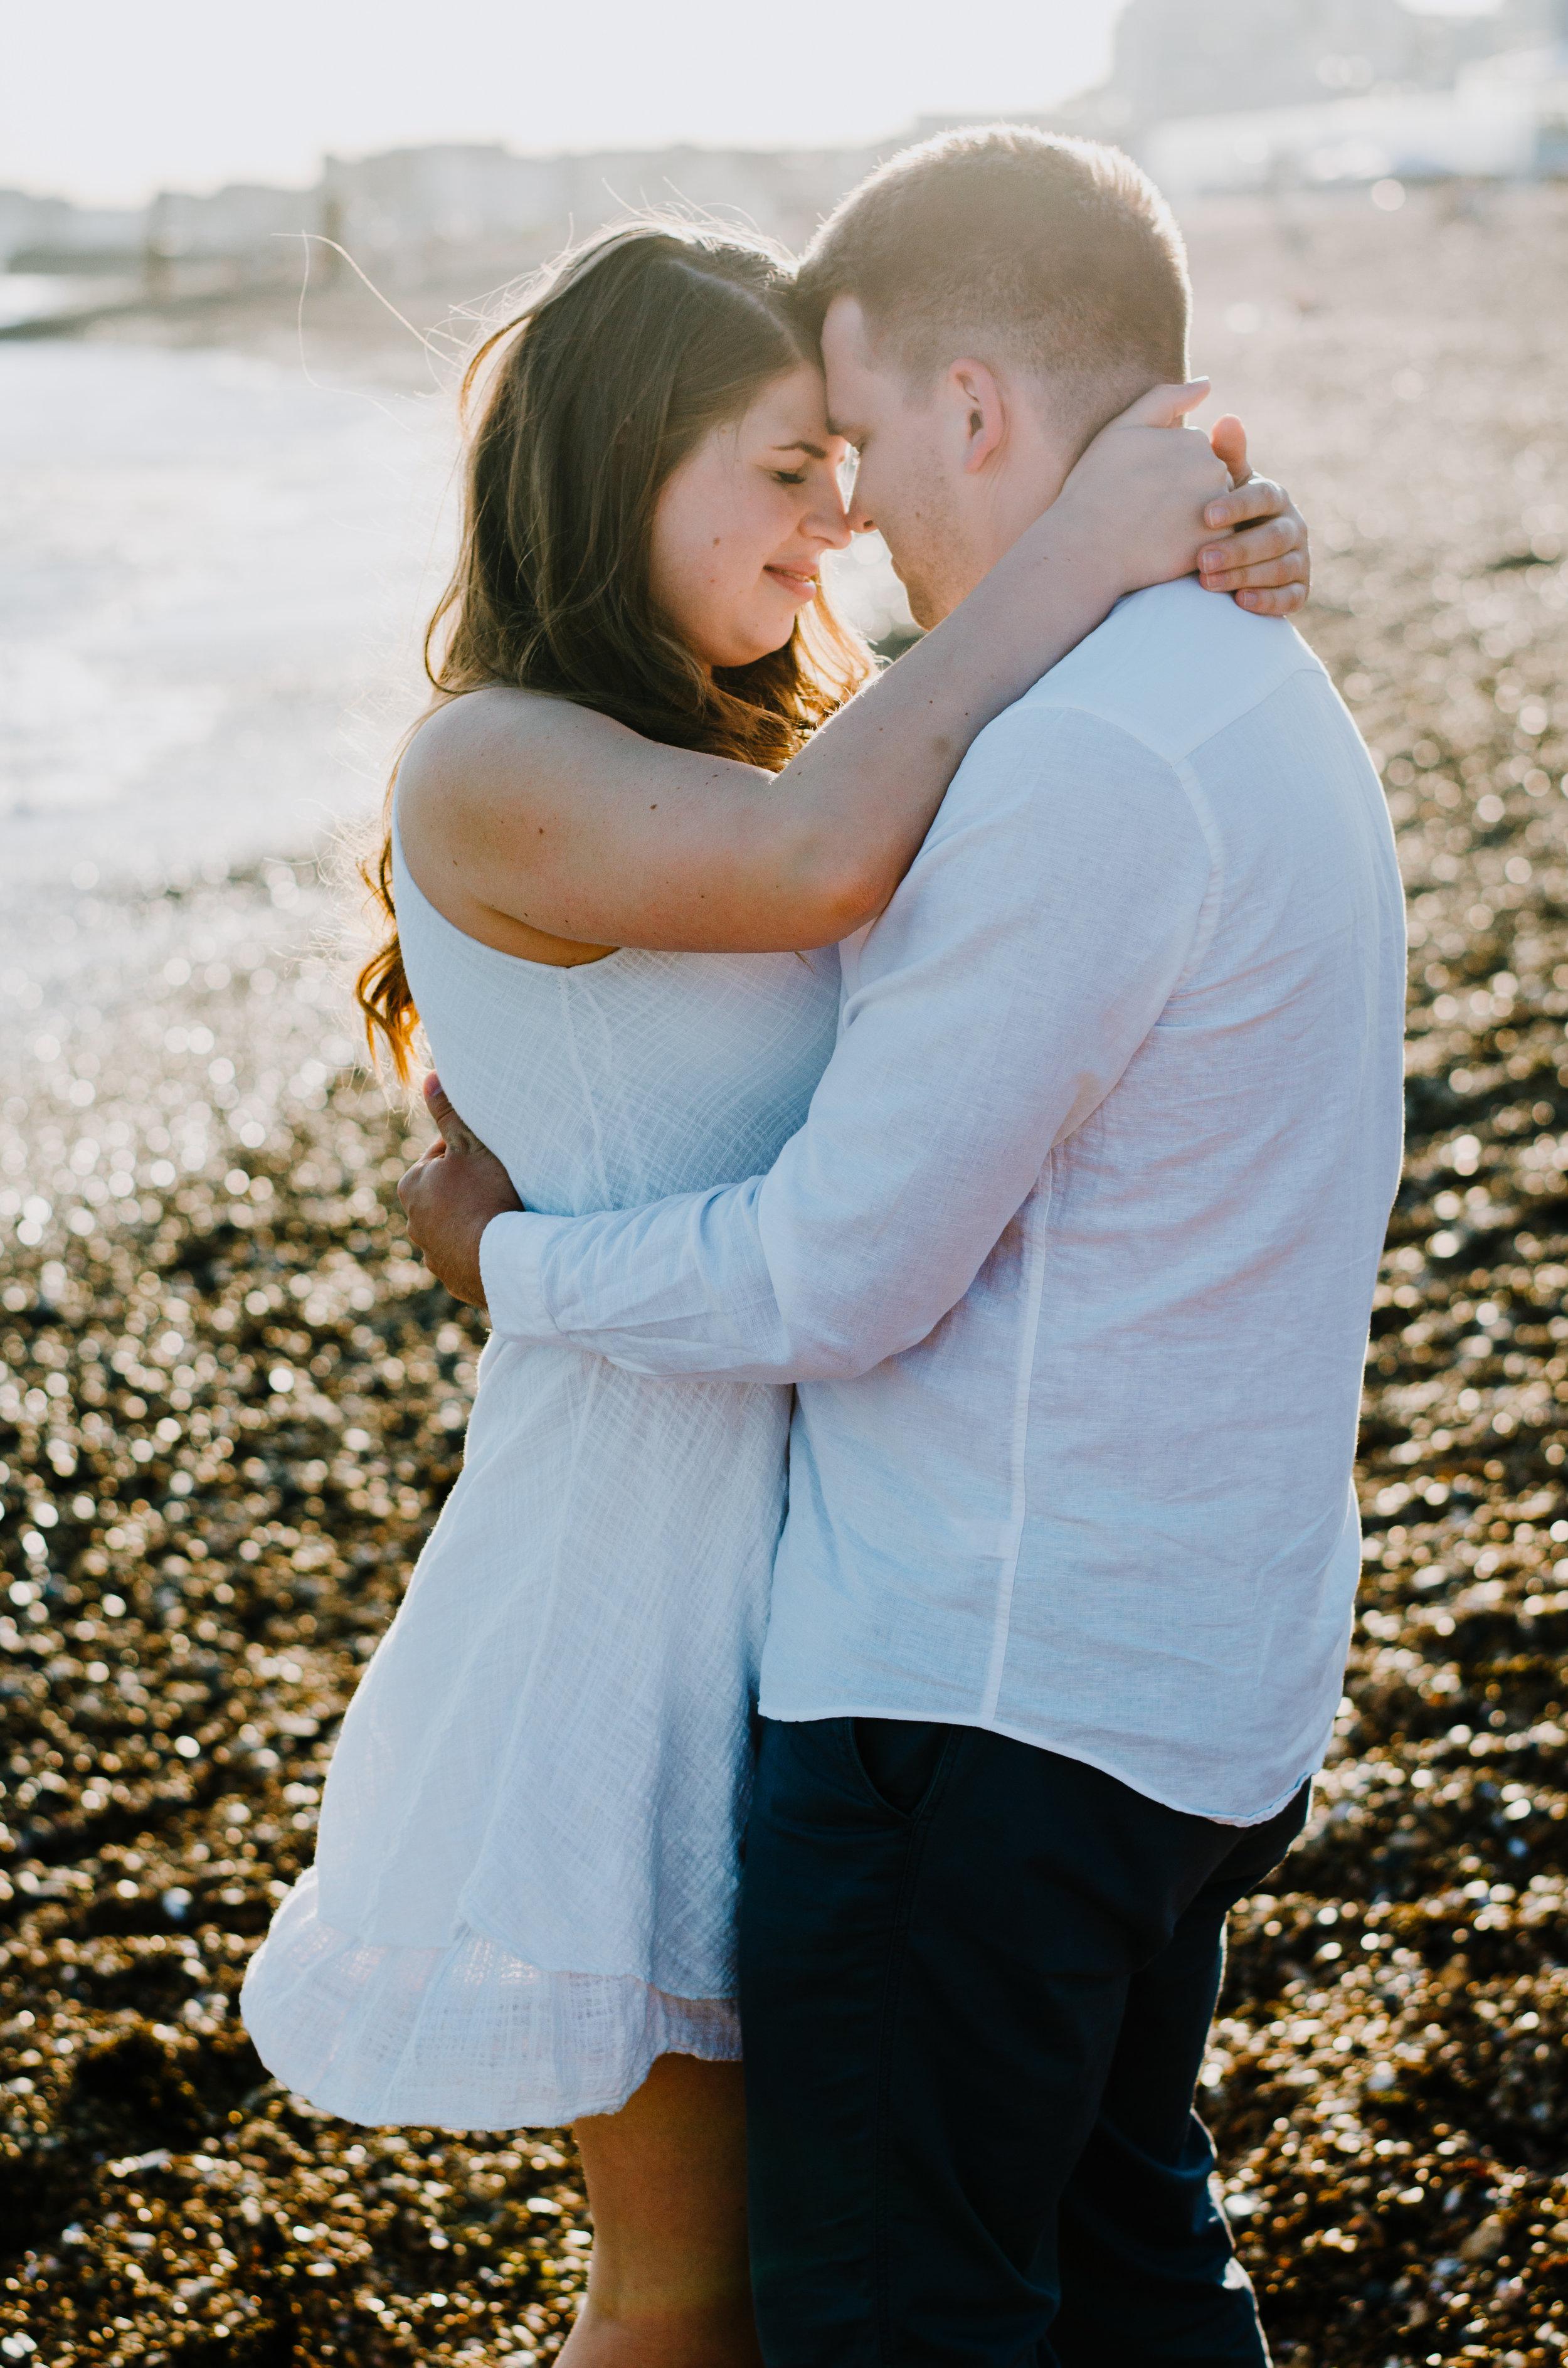 Ieva & Julius - Brighton Beach - Couple Session - Aiste Saulyte Photography-4.jpg